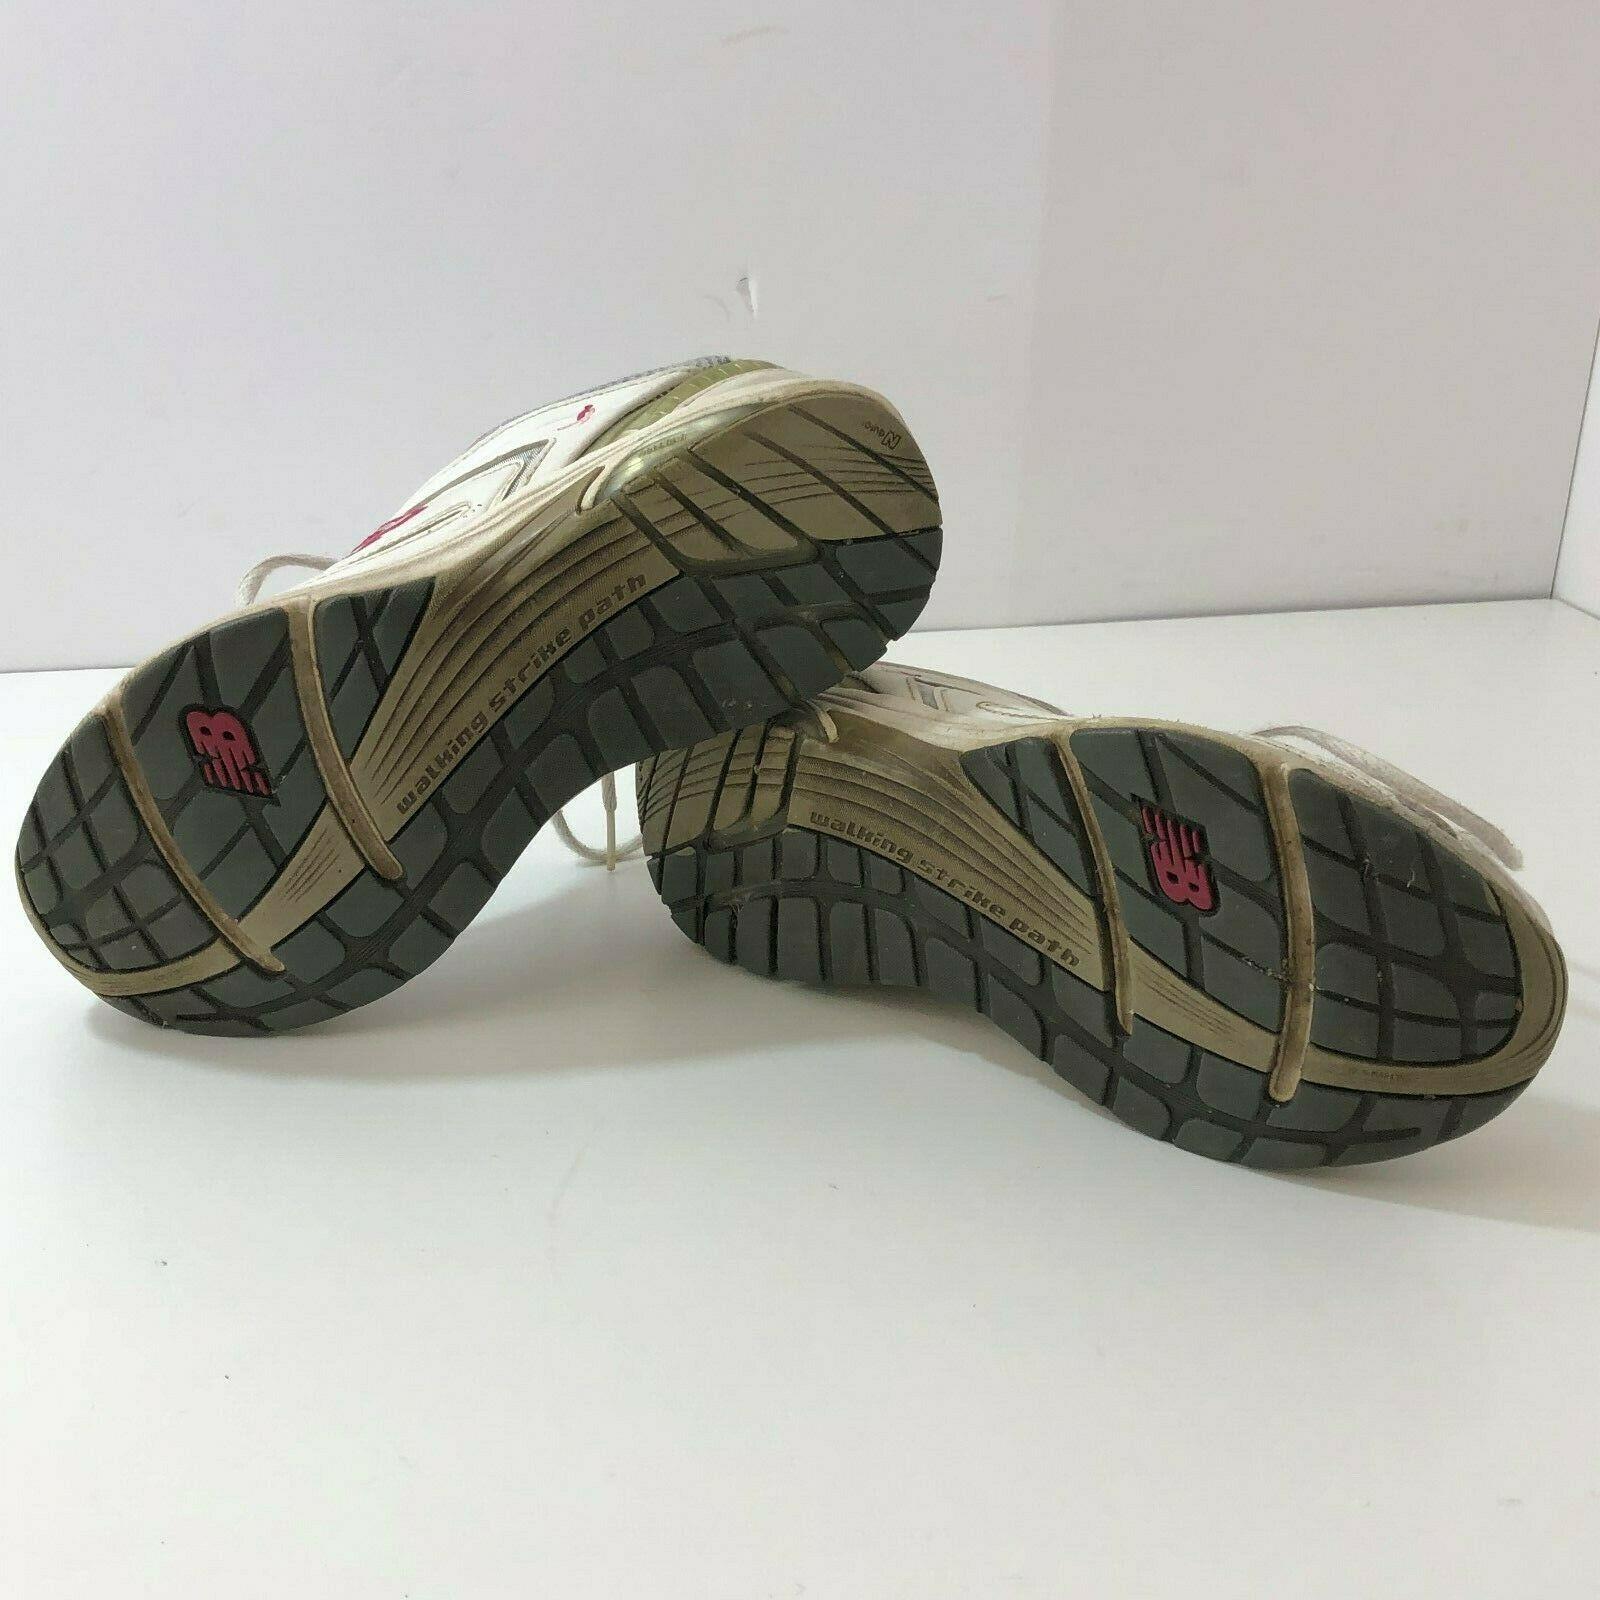 NEW BALANCE Susan G Komen Breast Cancer Awareness Walking Sneakers Womens Size 8